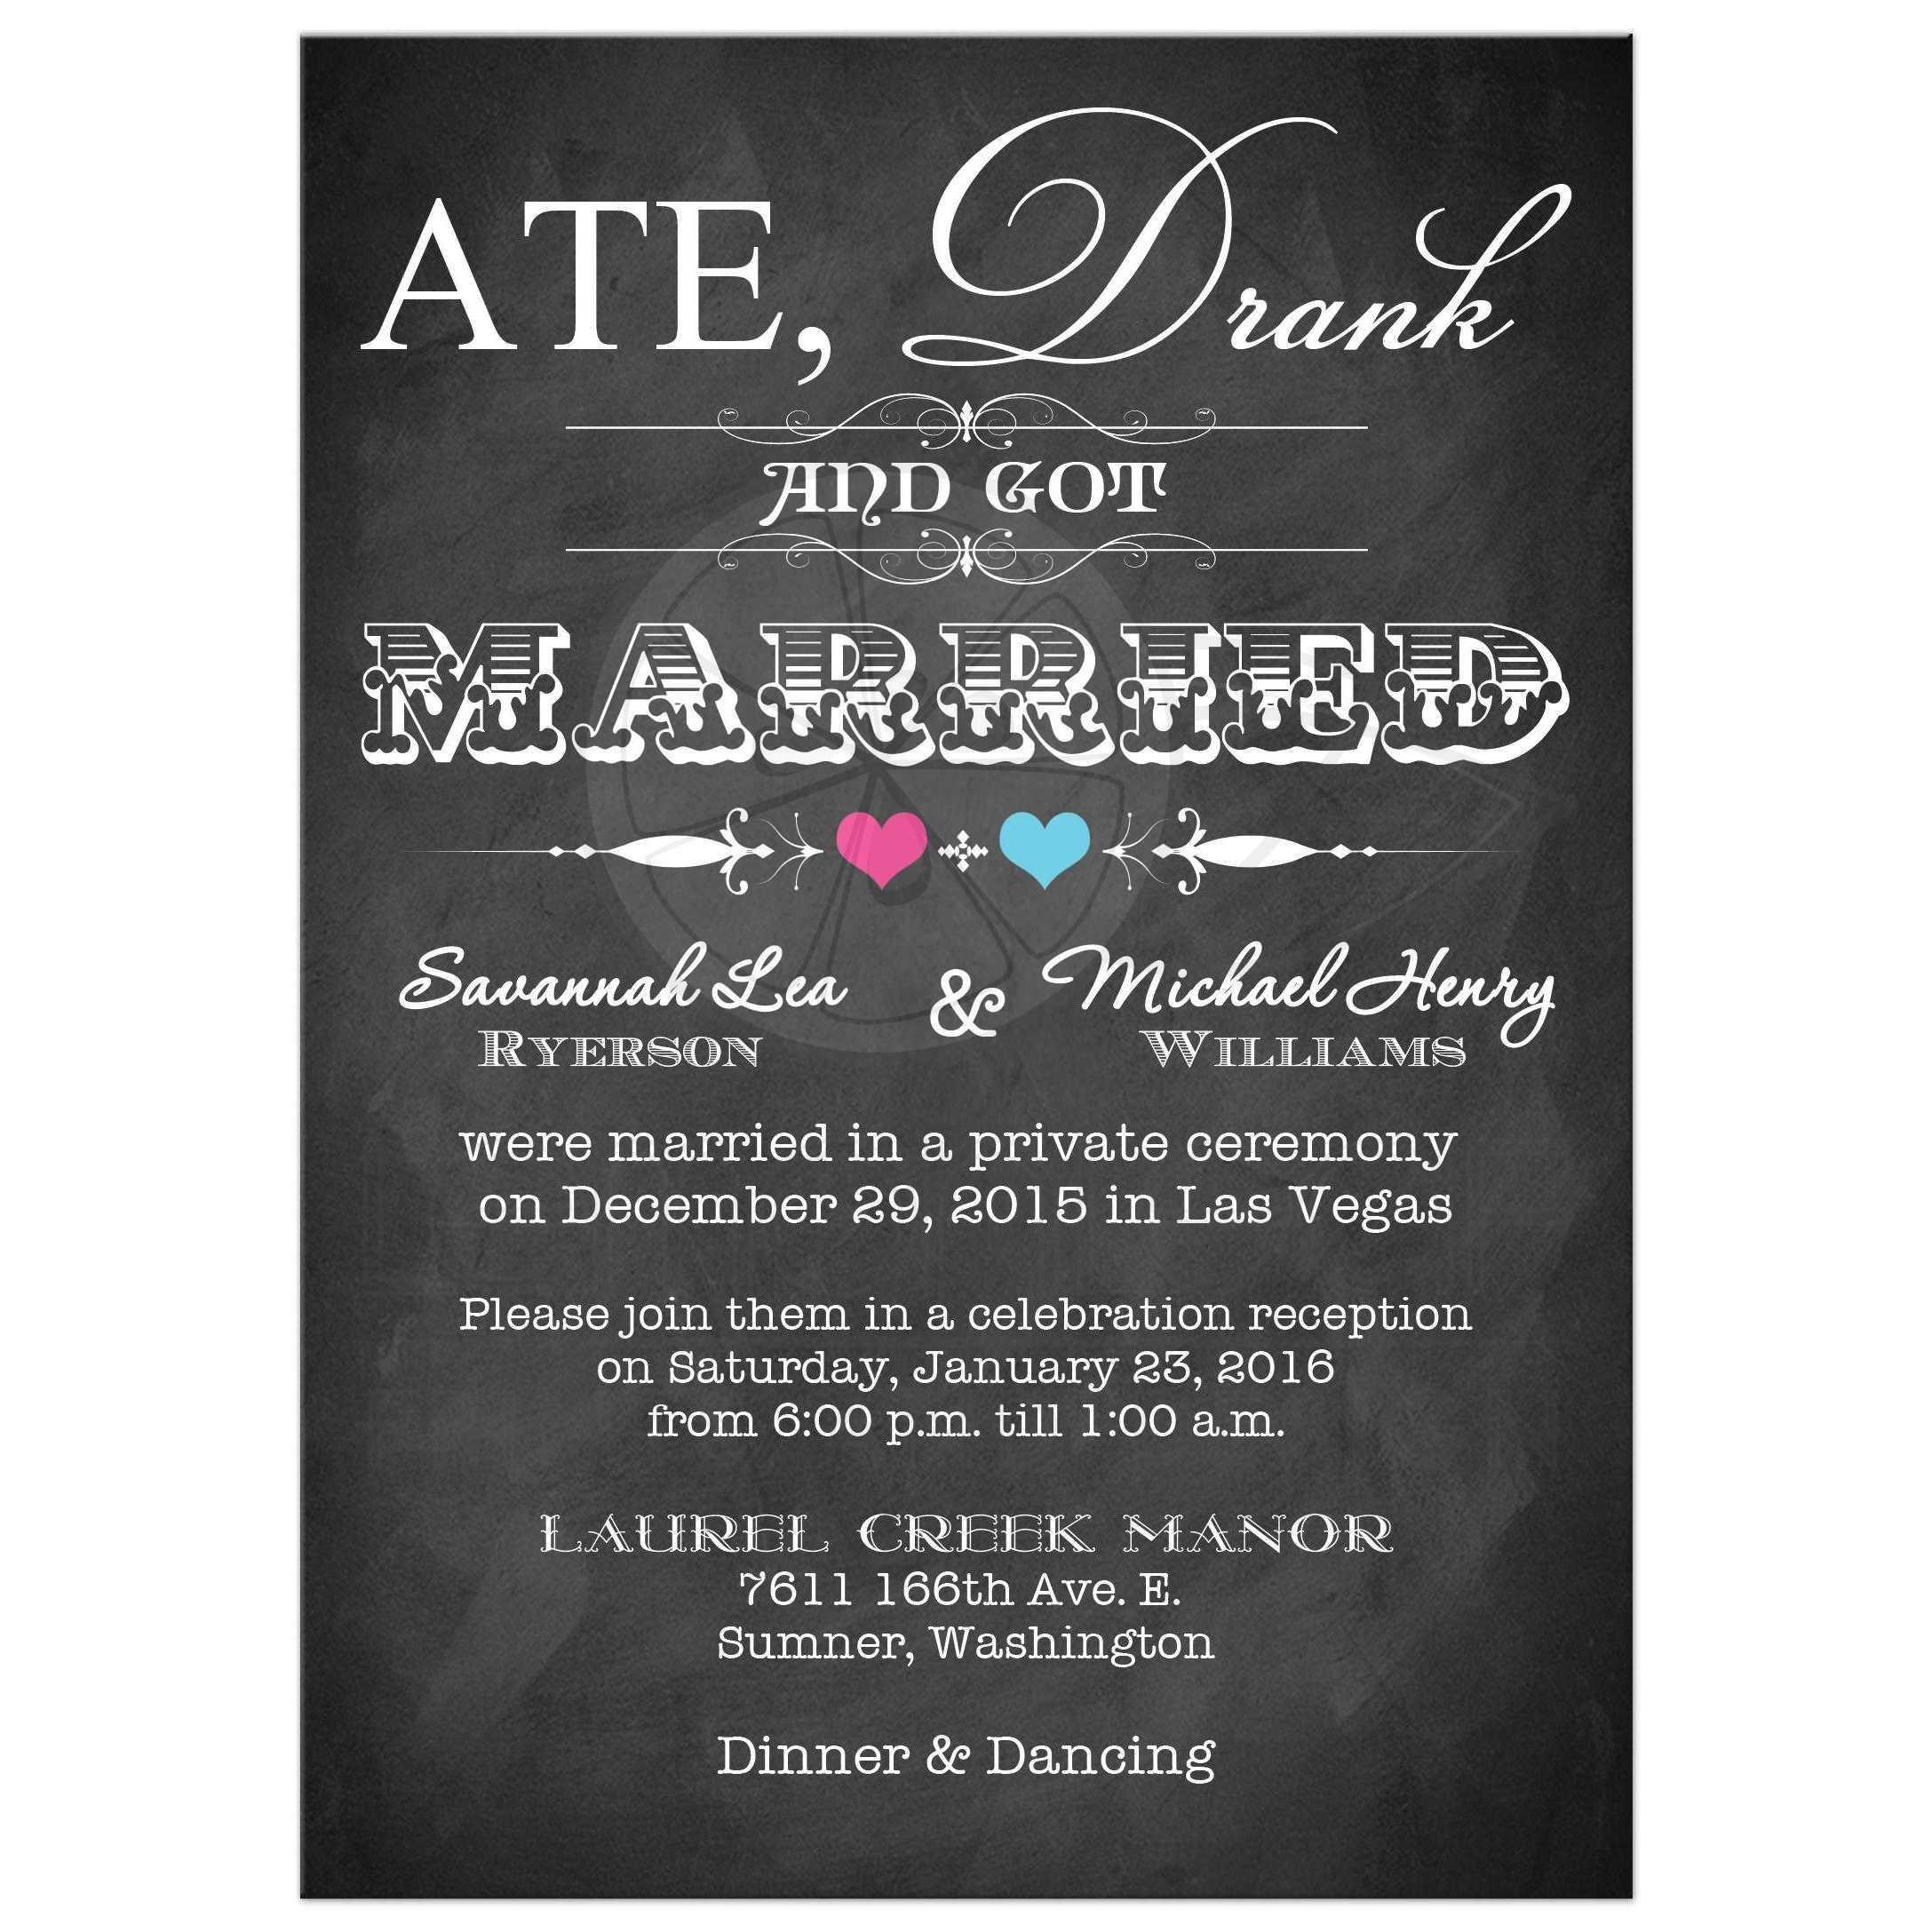 PostWedding Invitation Chalkboard Scrolls Pink and Blue Hearts